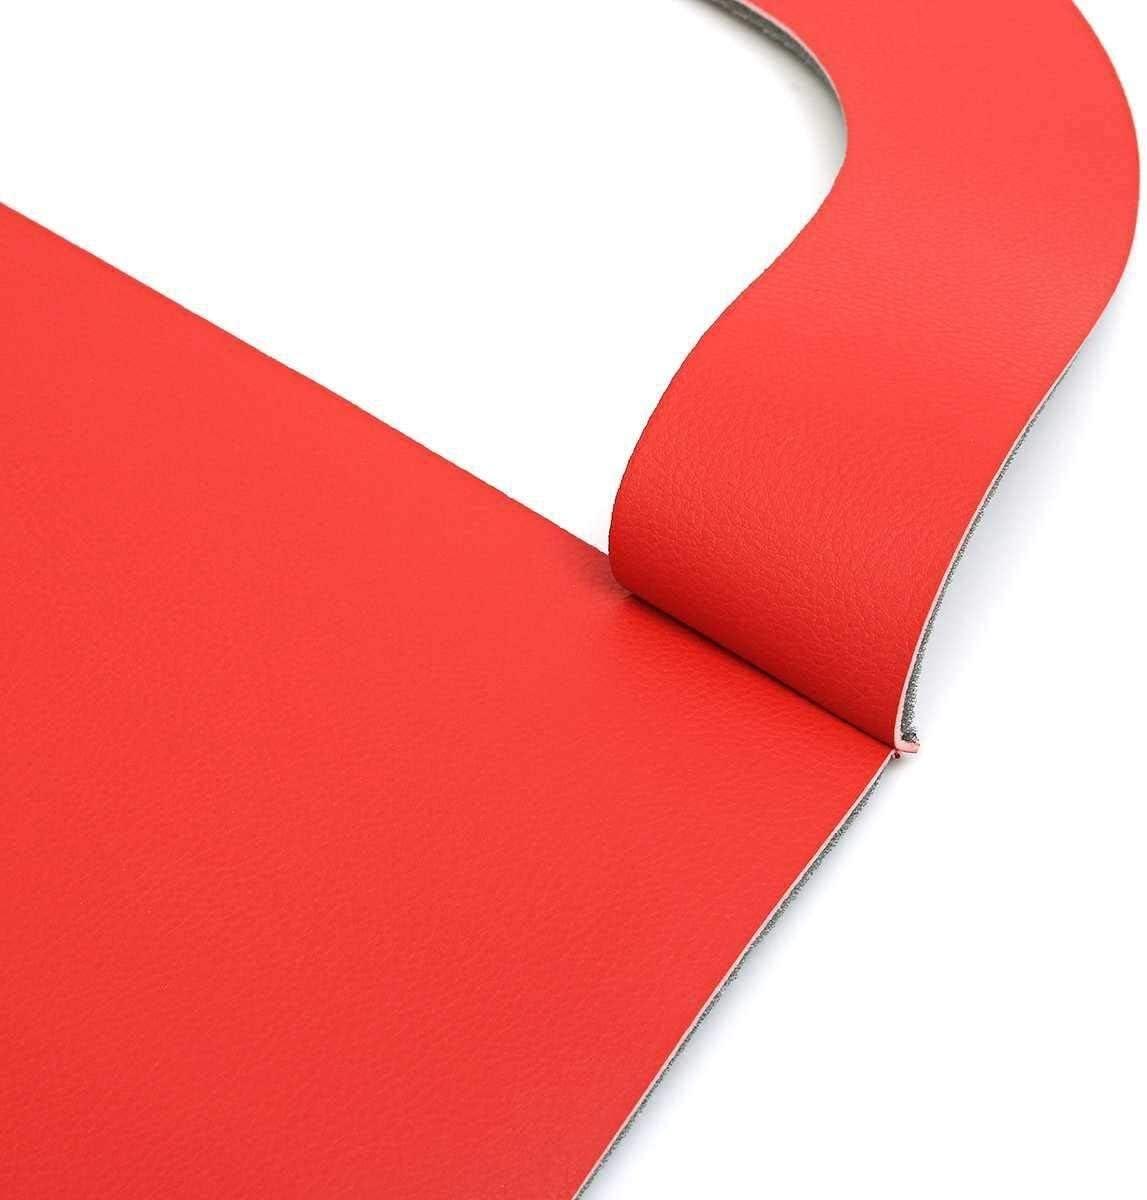 Color : Red Au/ßent/ürgriffe Autot/ürverkleidung Einsatz-Karten Staub Pad Kunstleder Rot for Mustang 2005-2009 Front Door Plattenteile